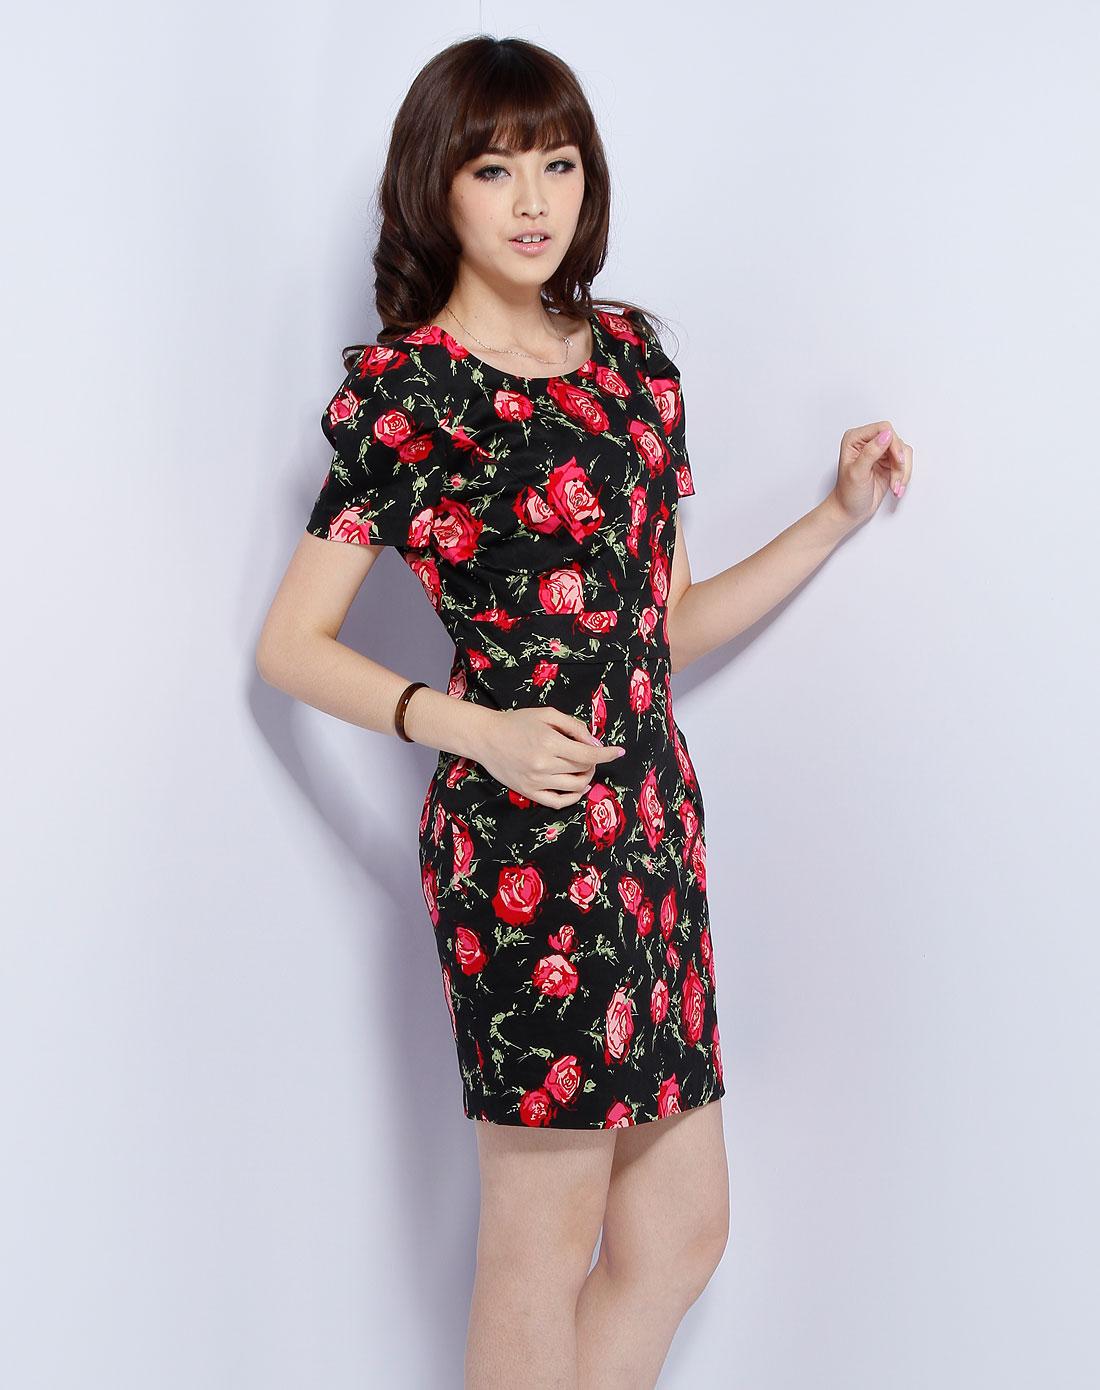 oasis黑/粉色印花短袖连衣裙